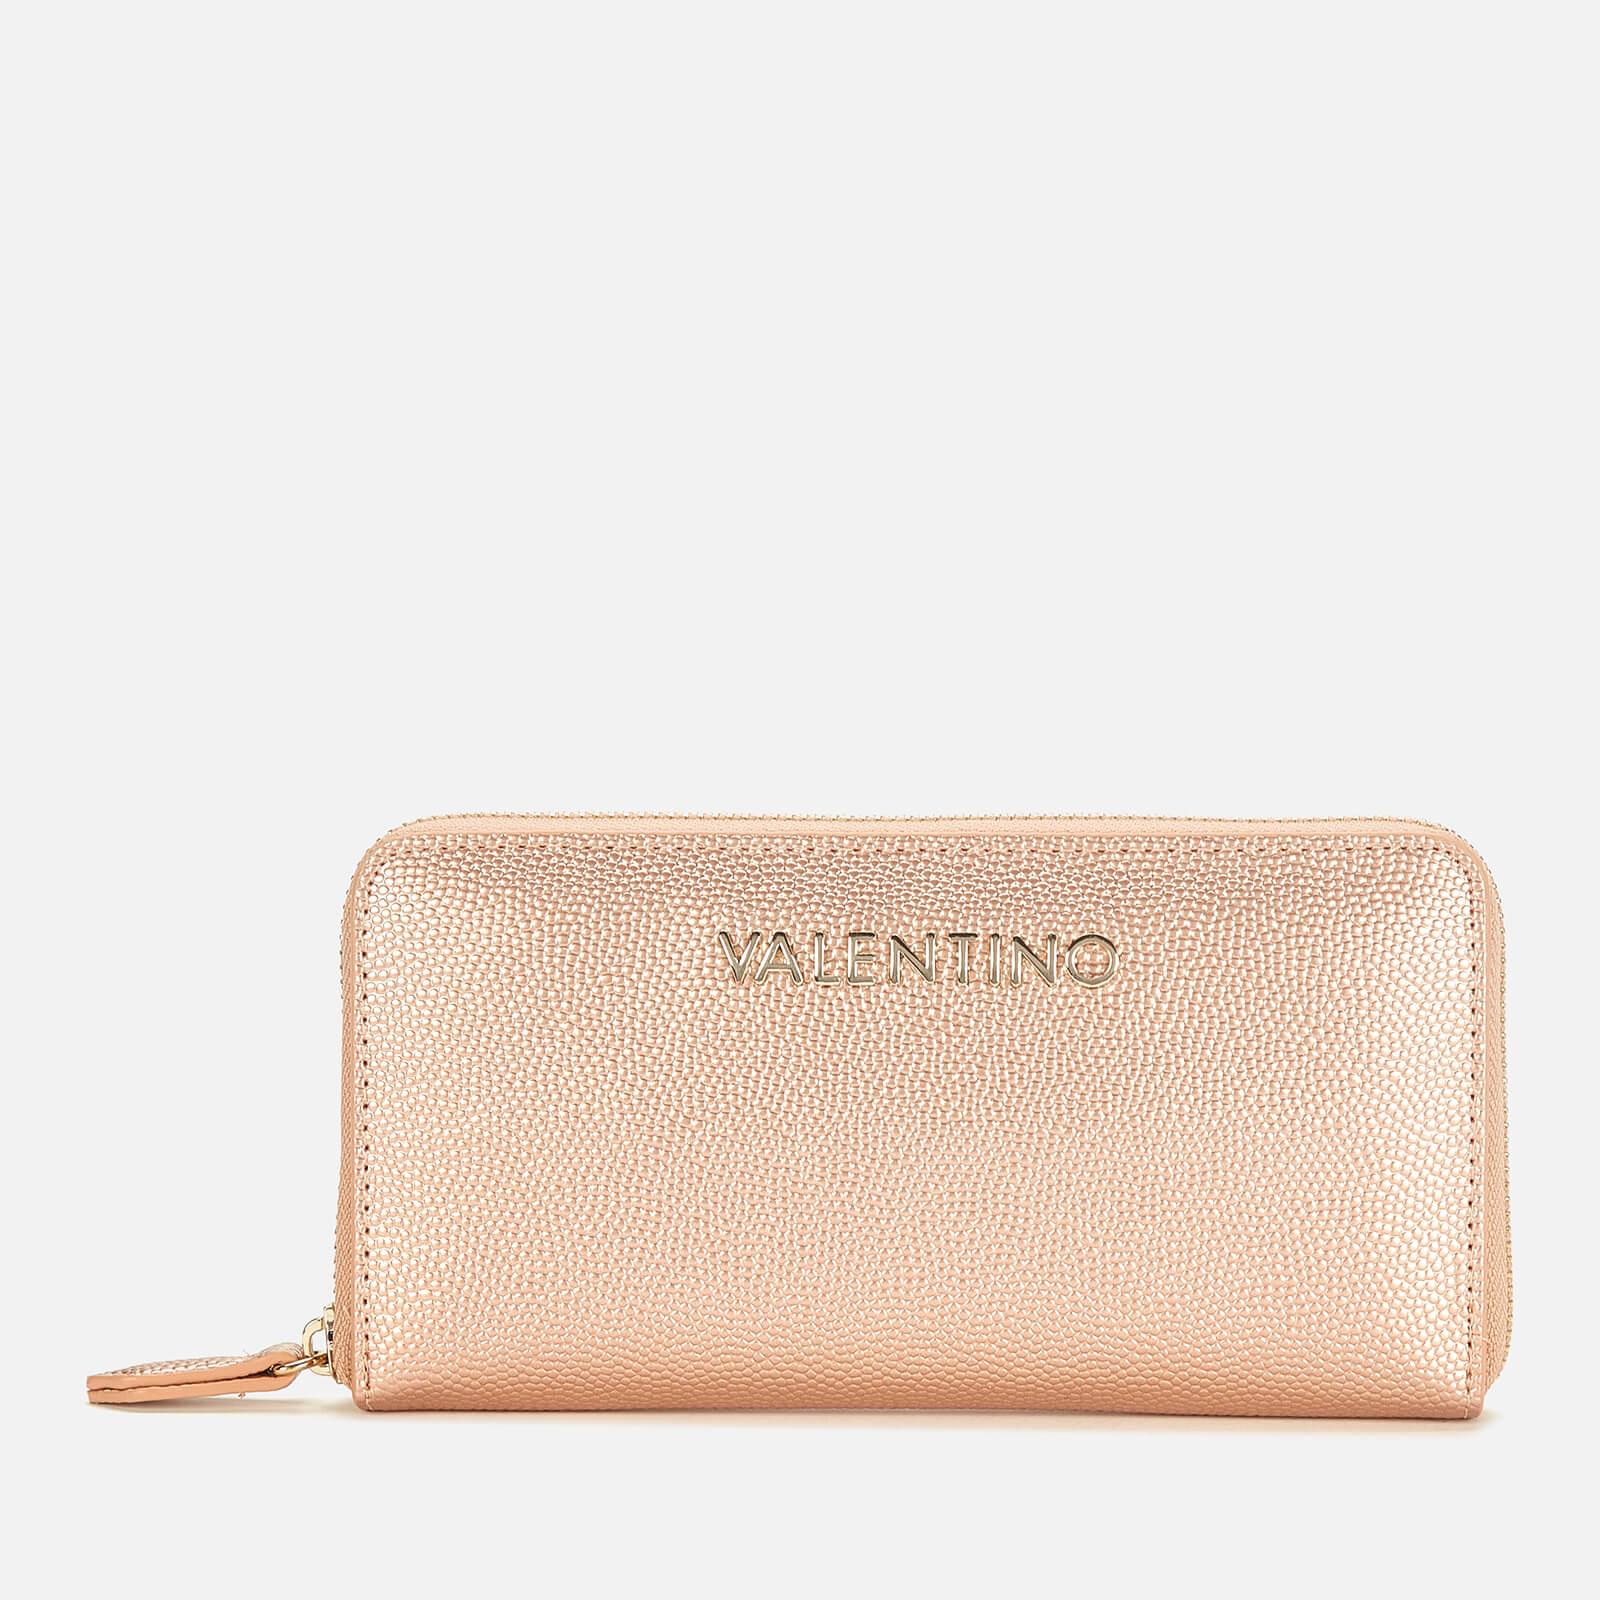 Valentino Bags Women's Divina Large Zip Around - Rose Gold